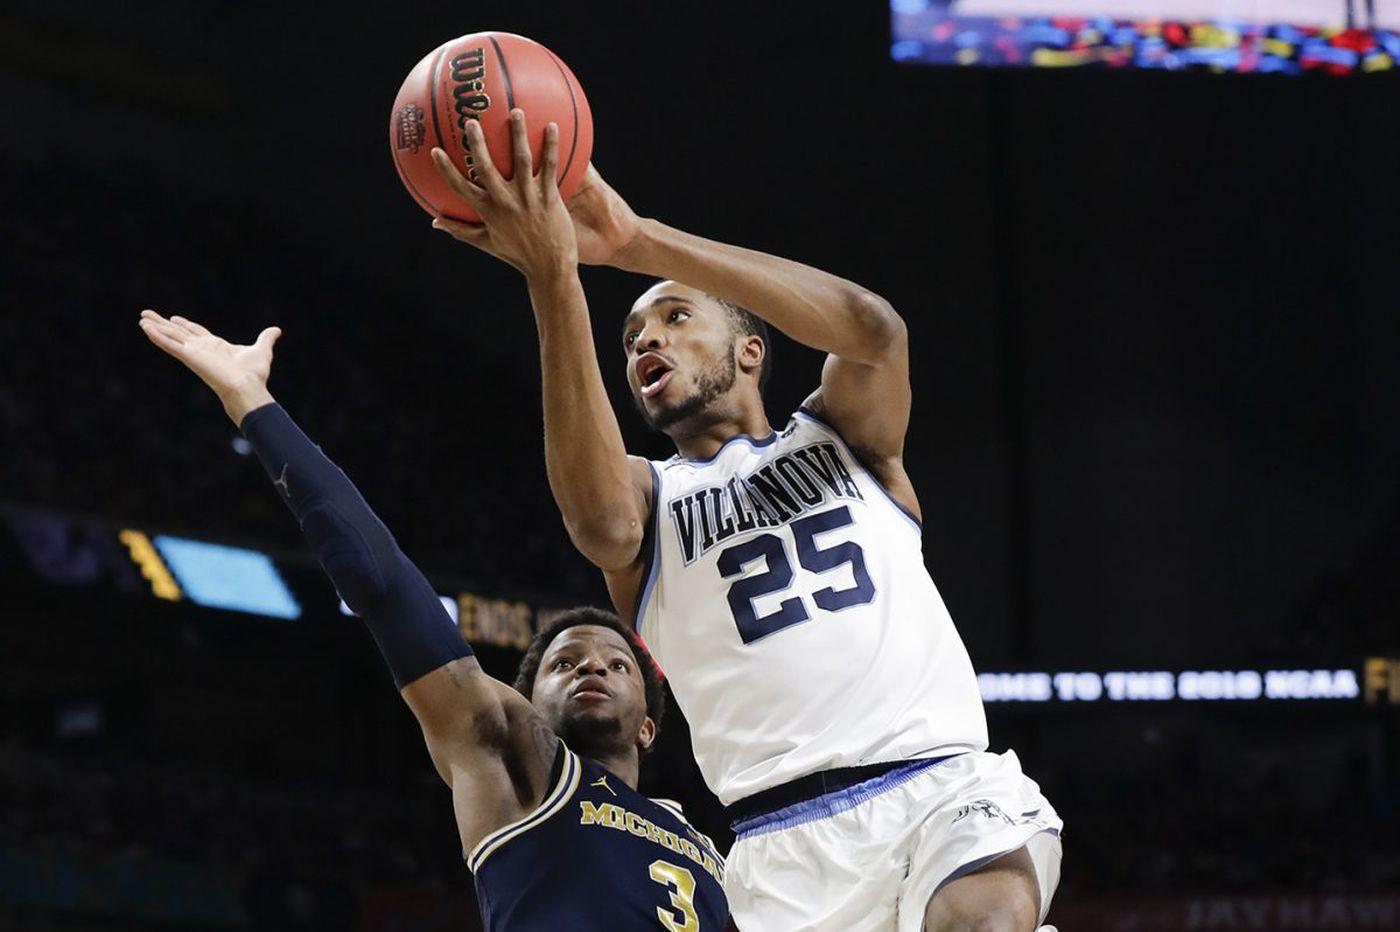 Villanova's Mikal Bridges passing up final season to enter NBA draft